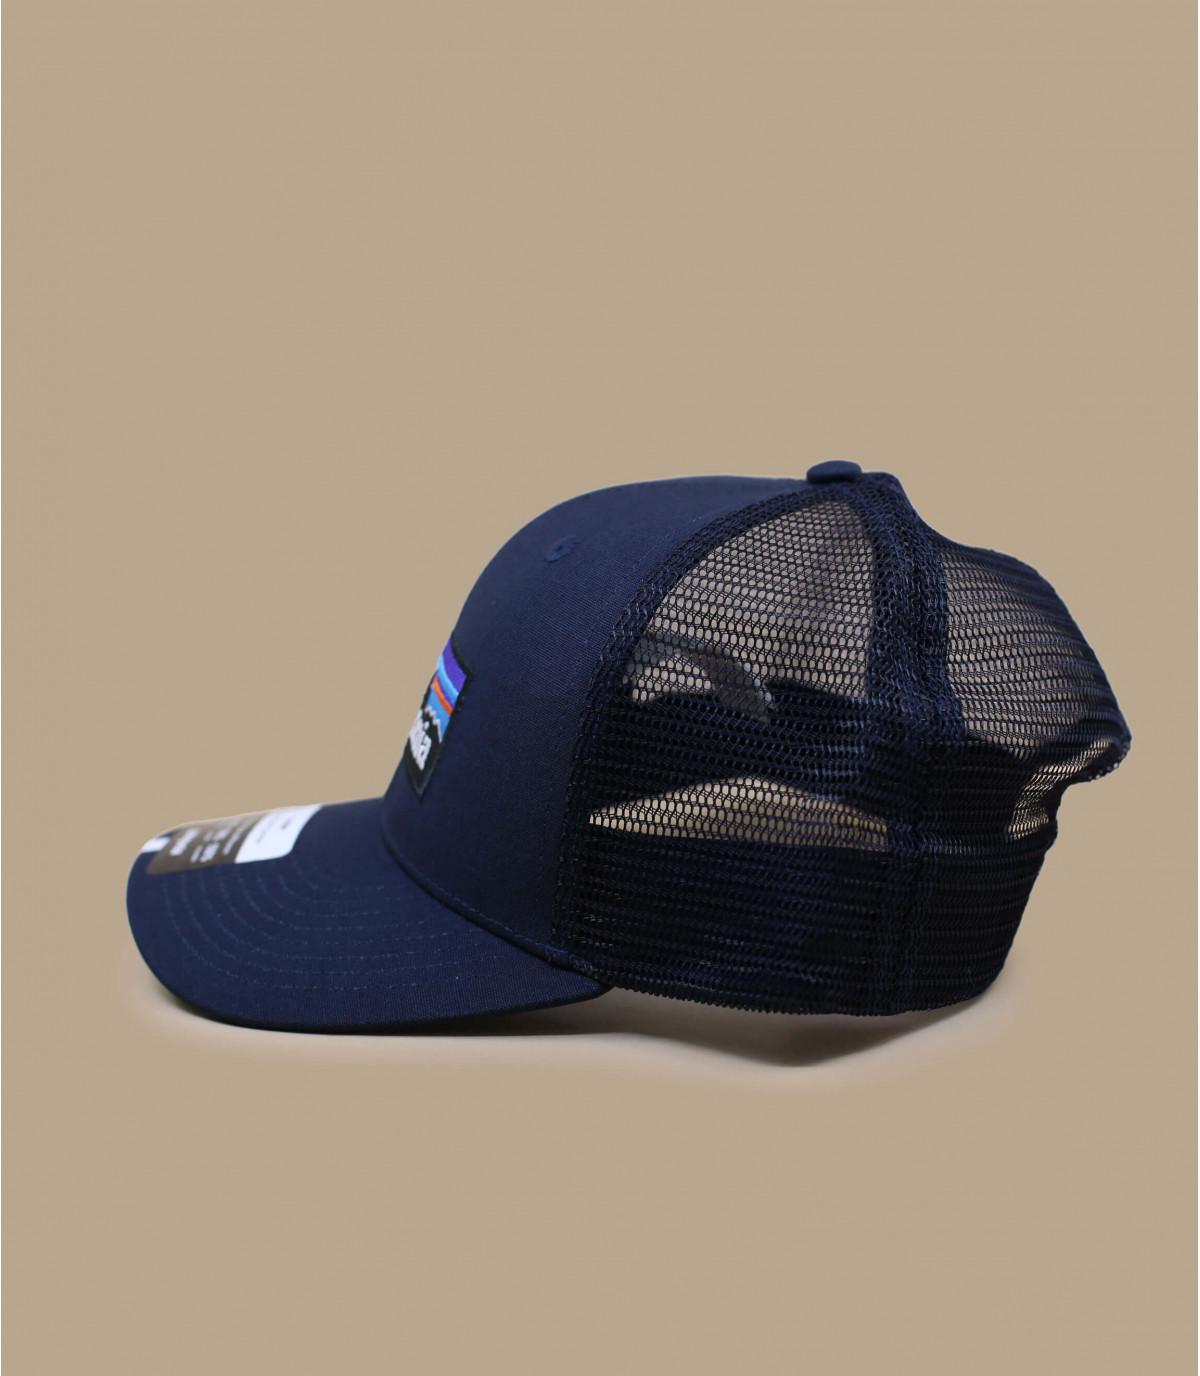 51792052779 Navy trucker cap - P6 logo trucker hat navy blue by Patagonia. Headict